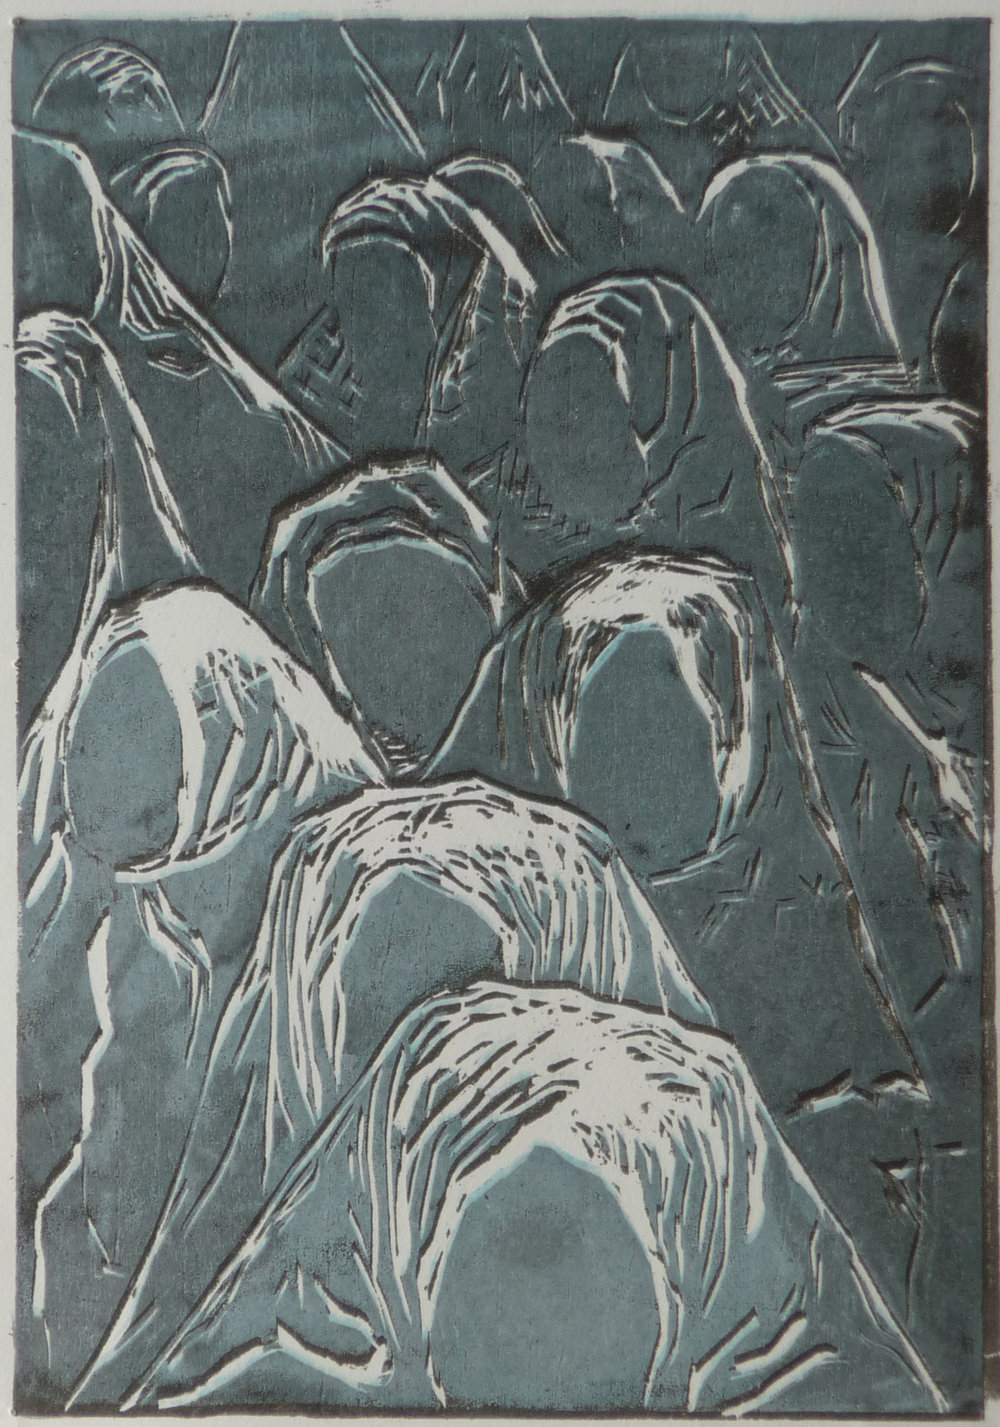 Groep, woodcut, 17,2 x 15 cm, 2016